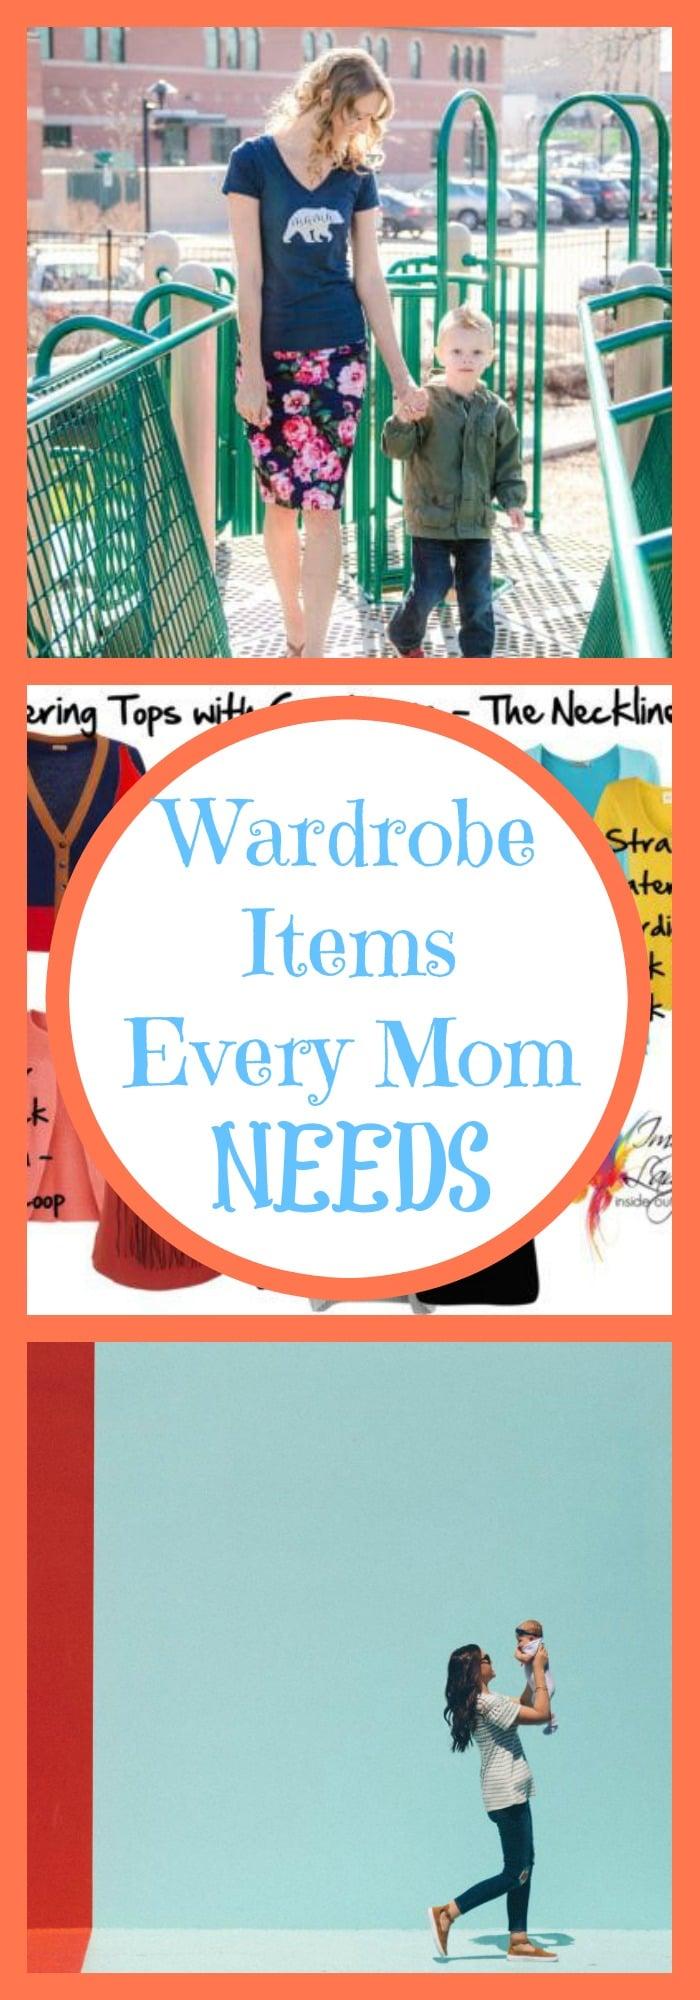 Wardrobe Items Every Mom Needs